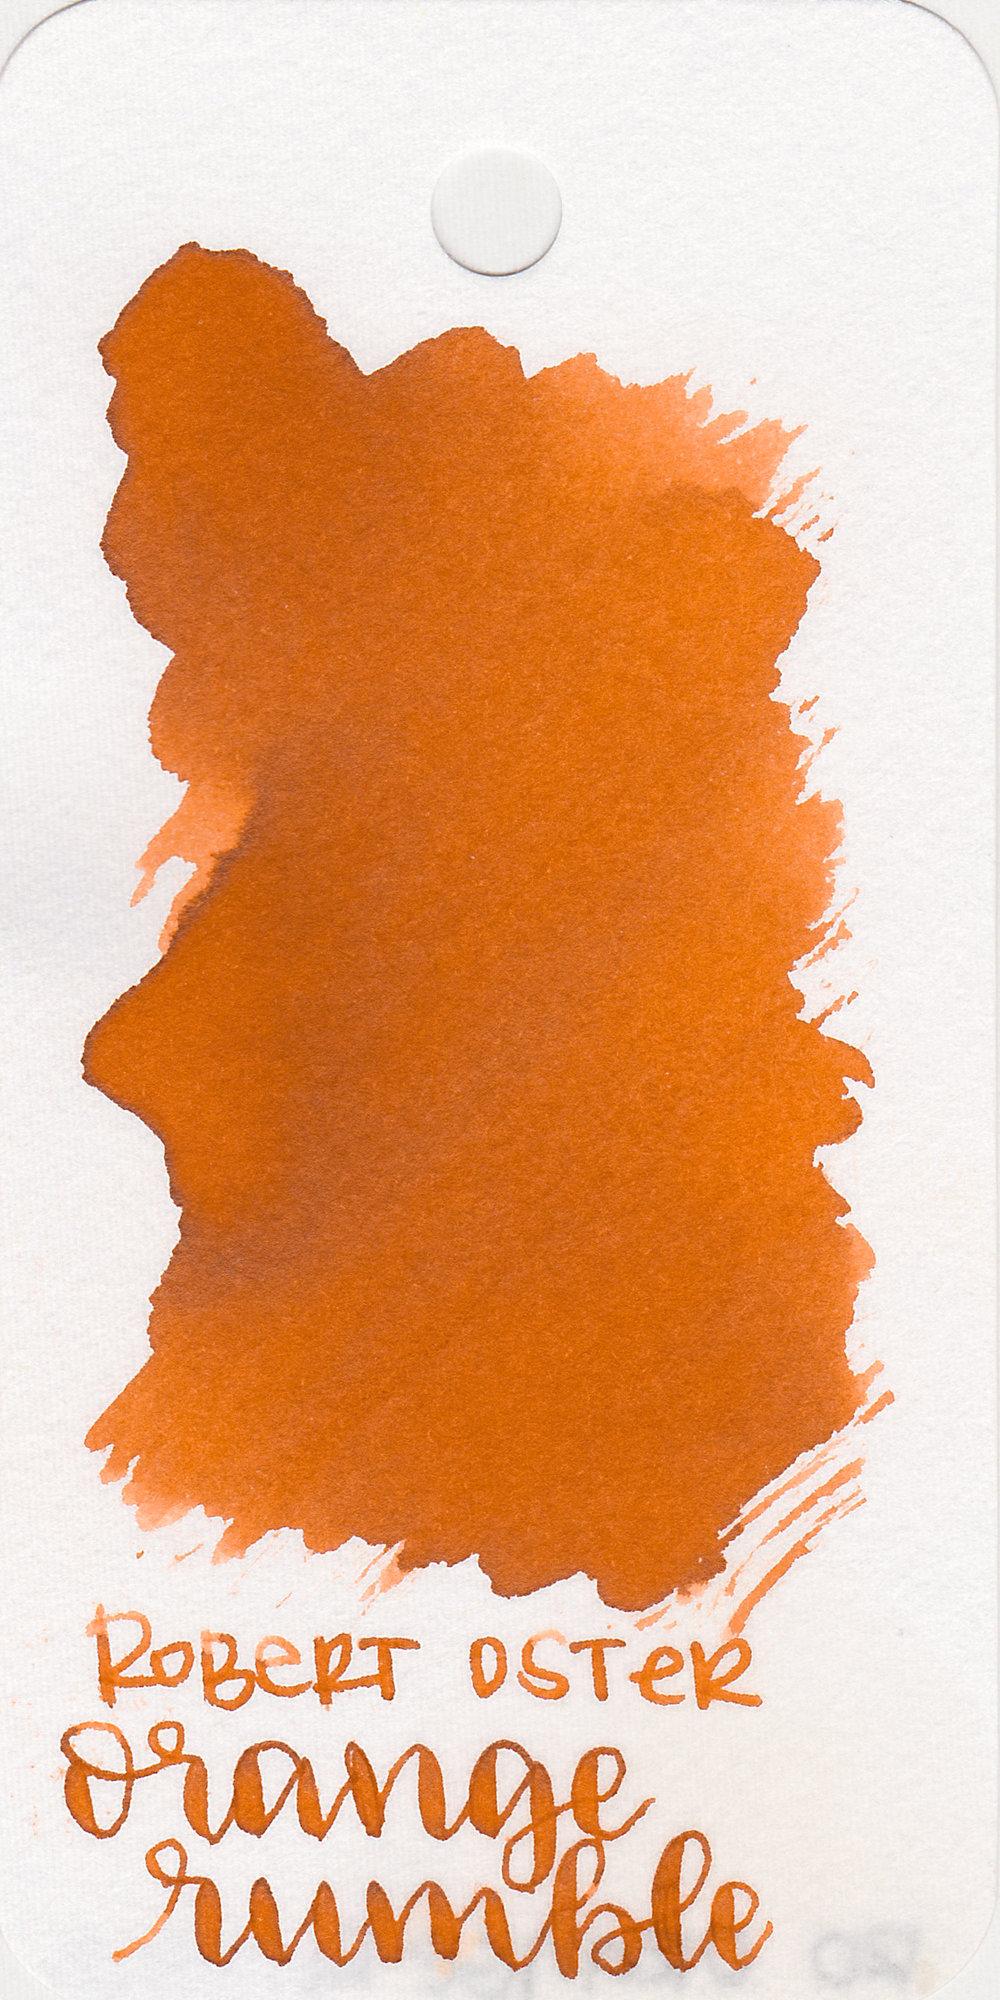 ro-orange-rumble-1.jpg